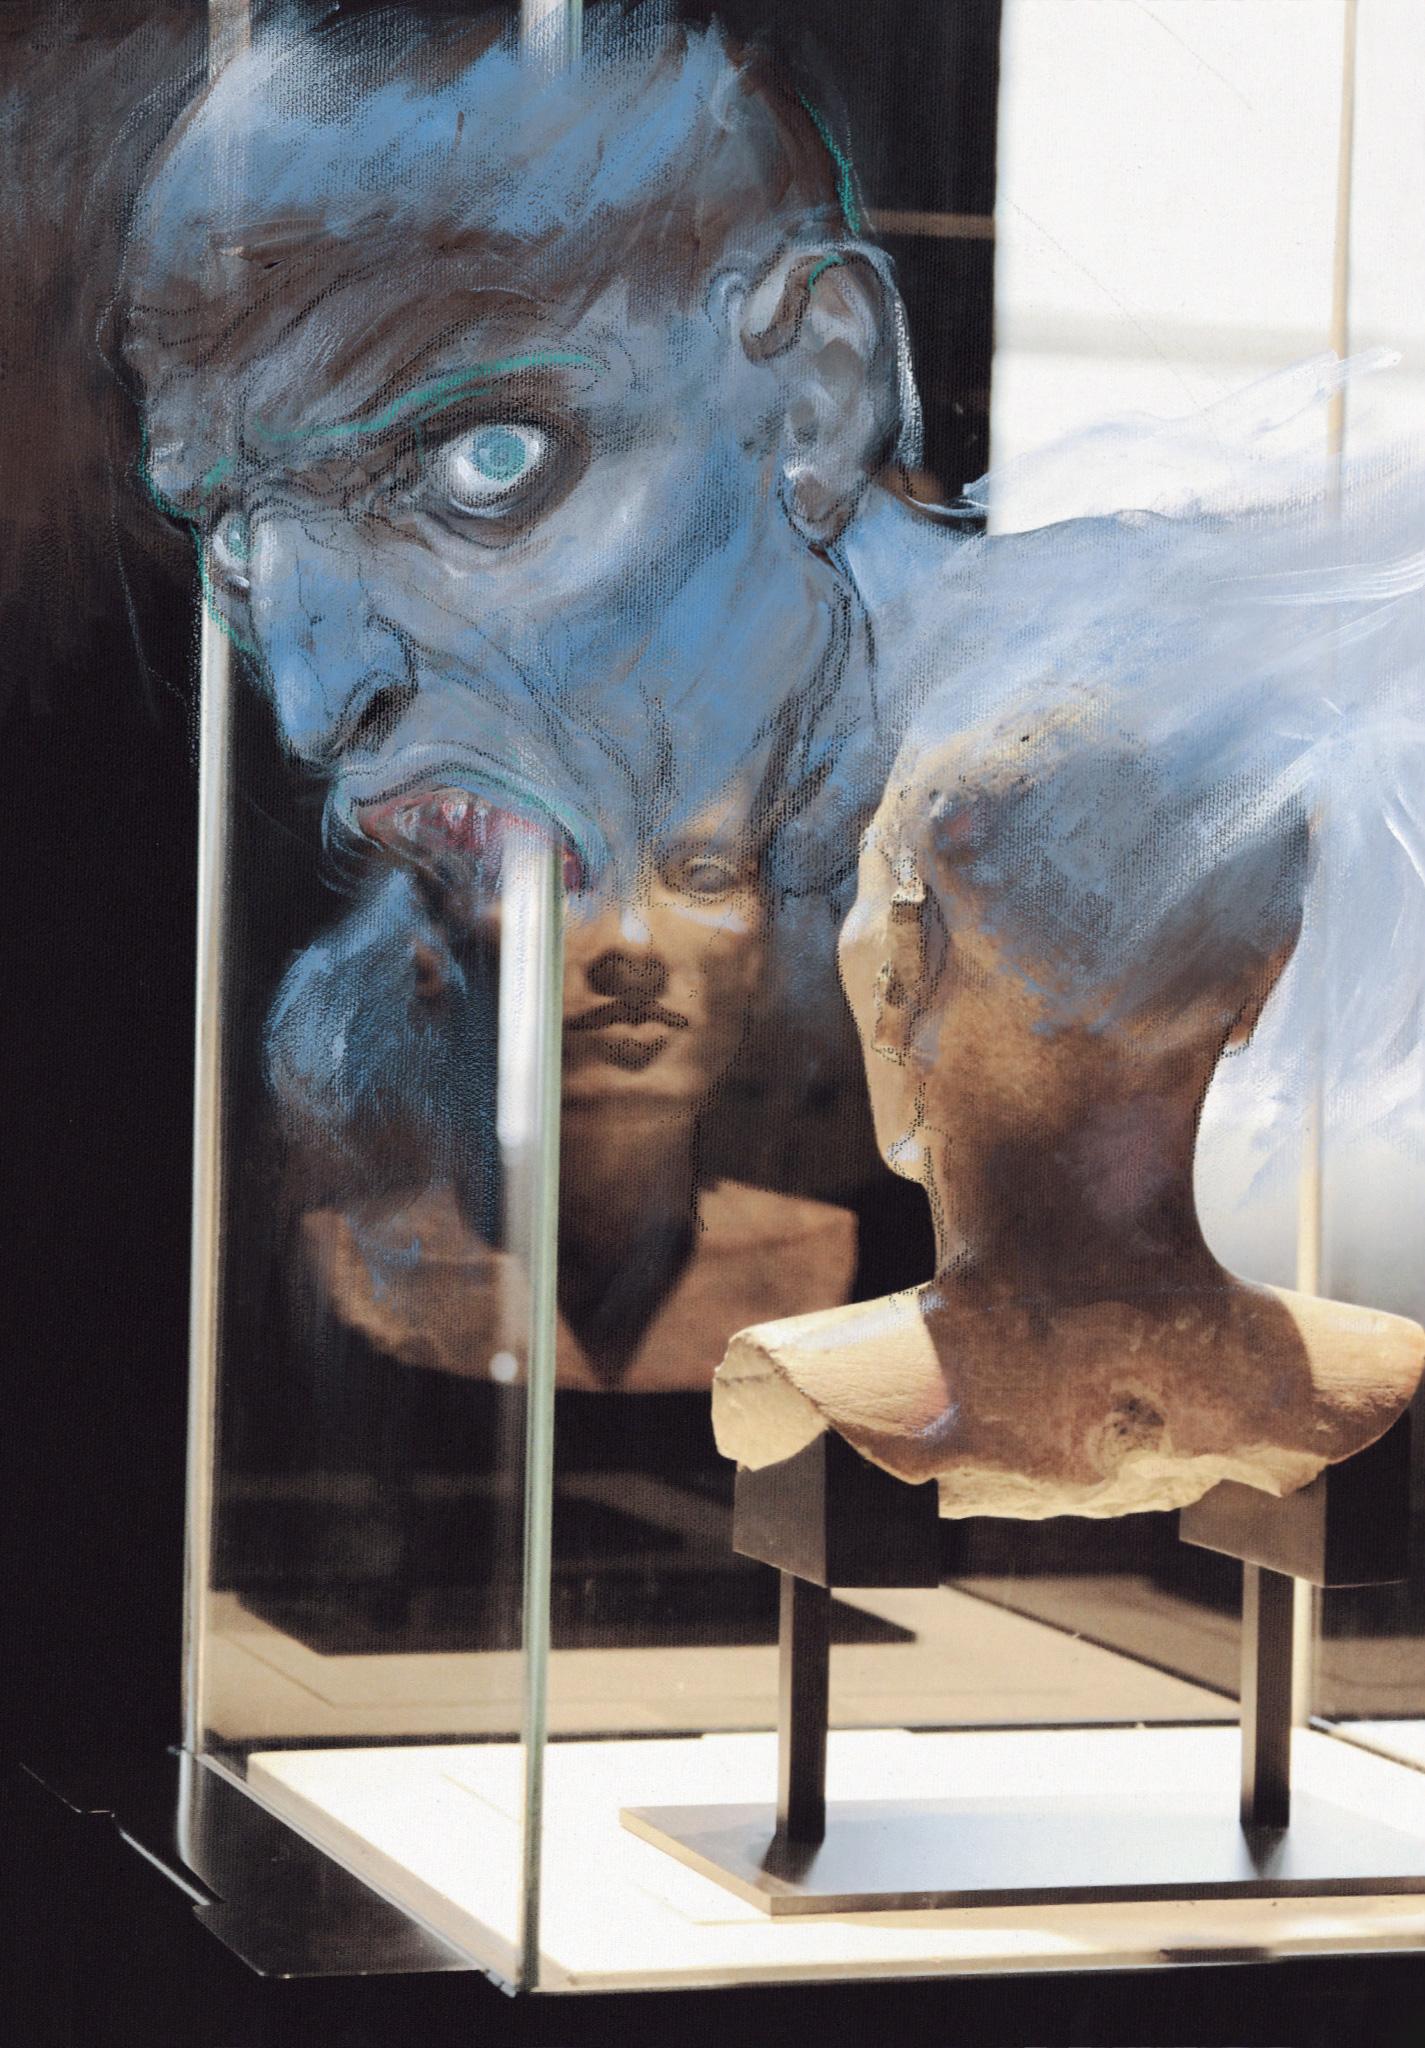 Bilal-fantomes-louvre-06.jpg